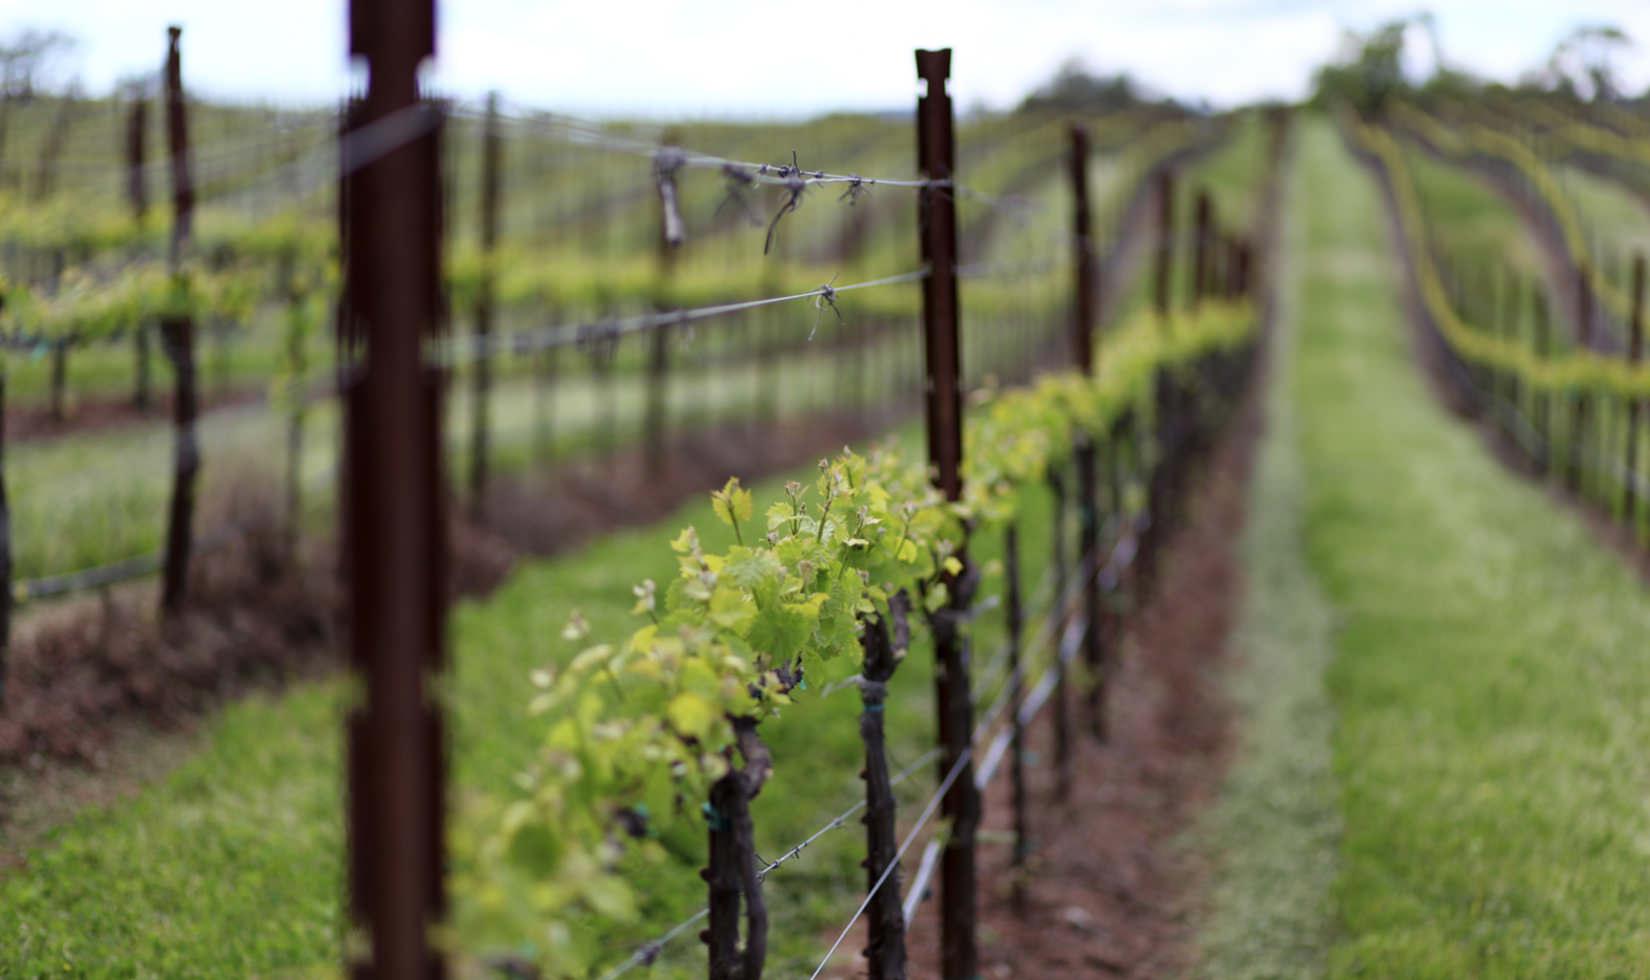 Vines beginning to bud